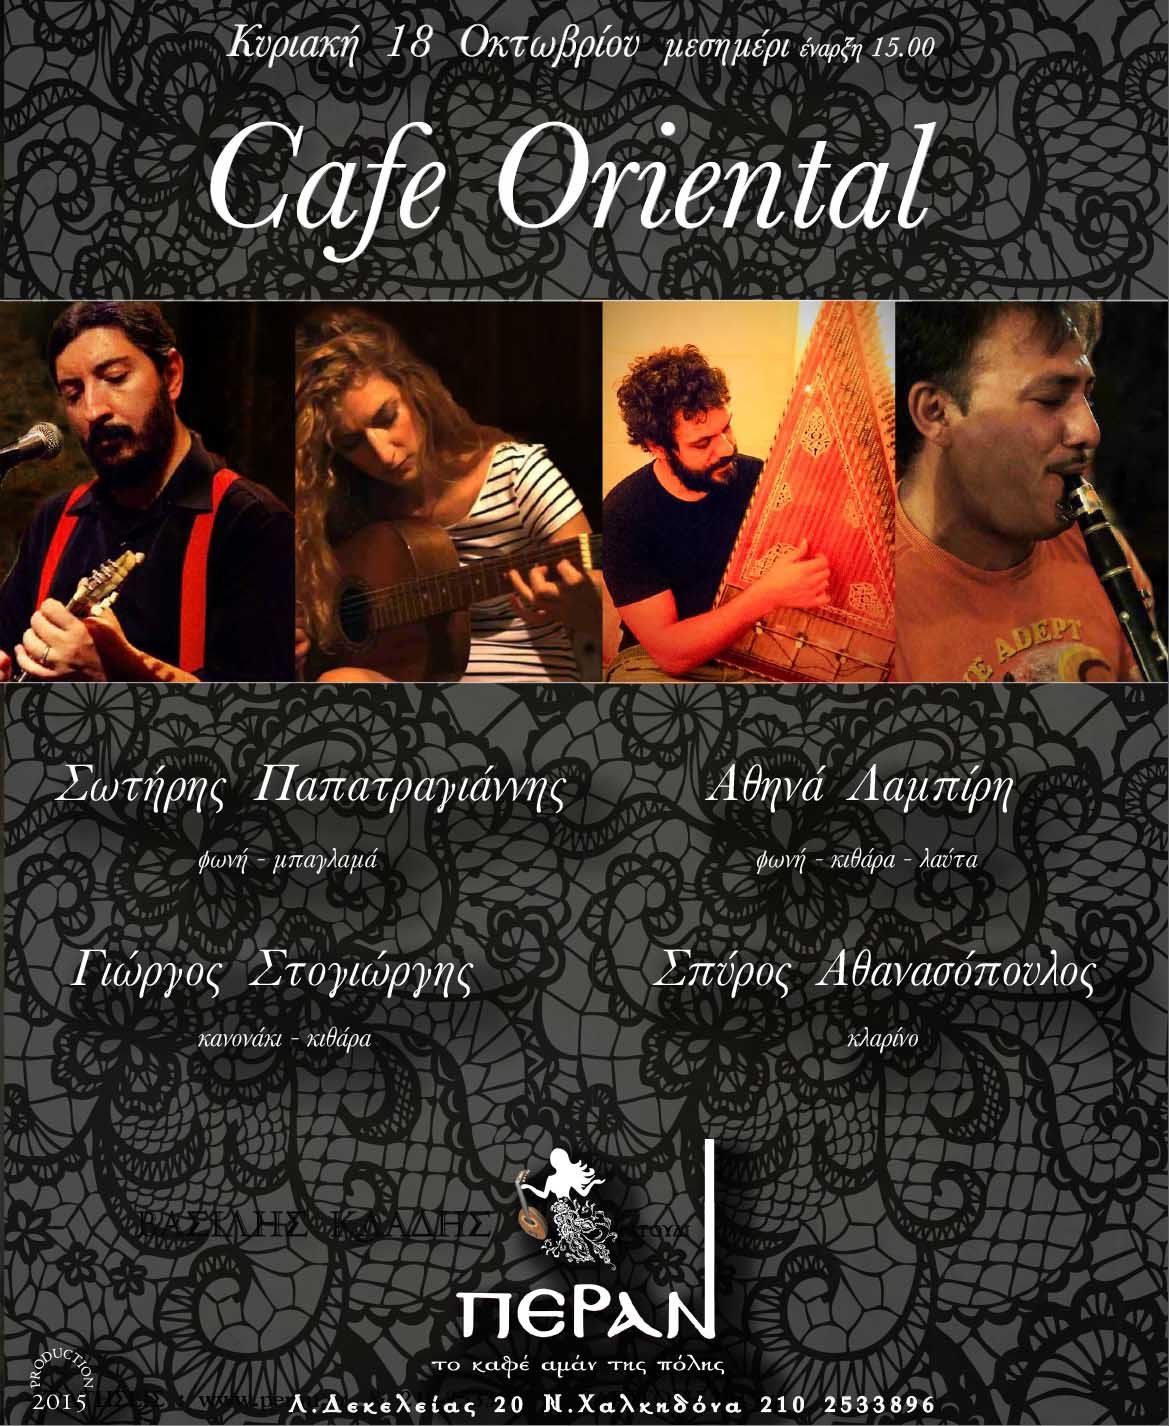 CafeOriental